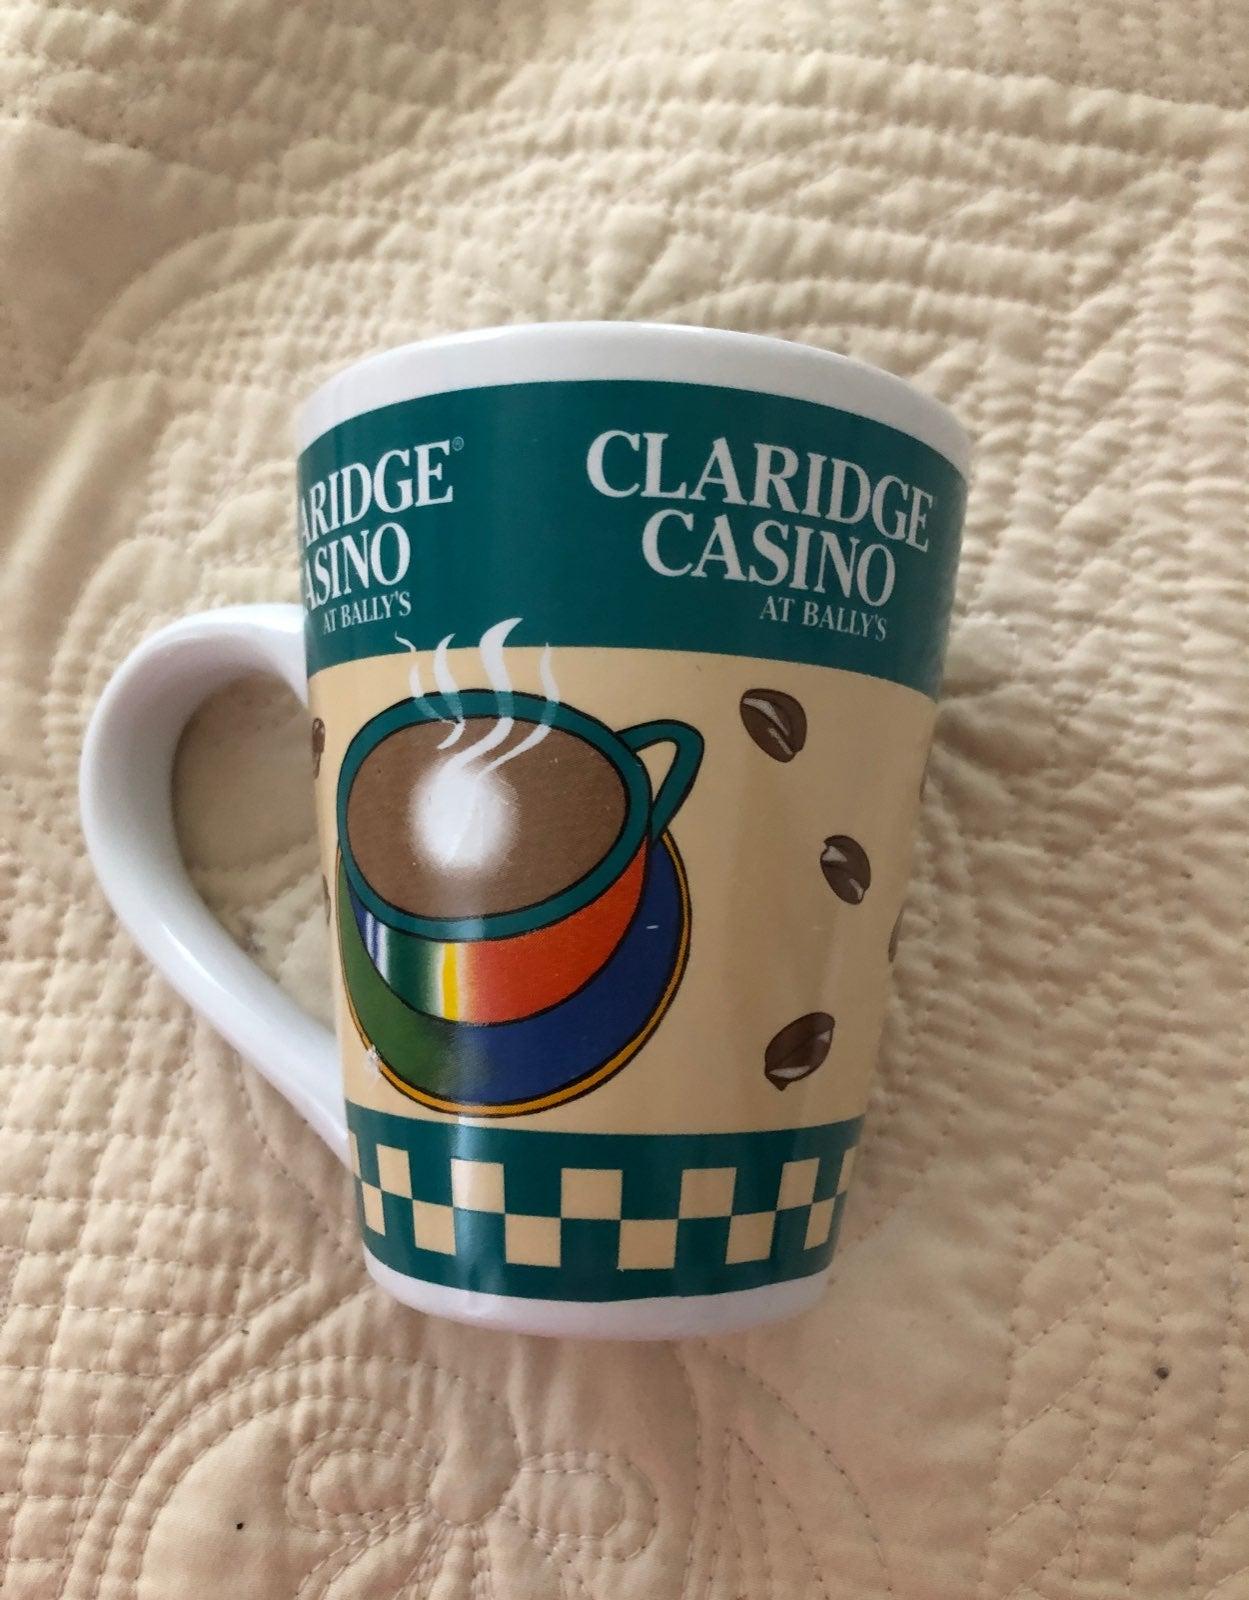 Claridge Casino mug